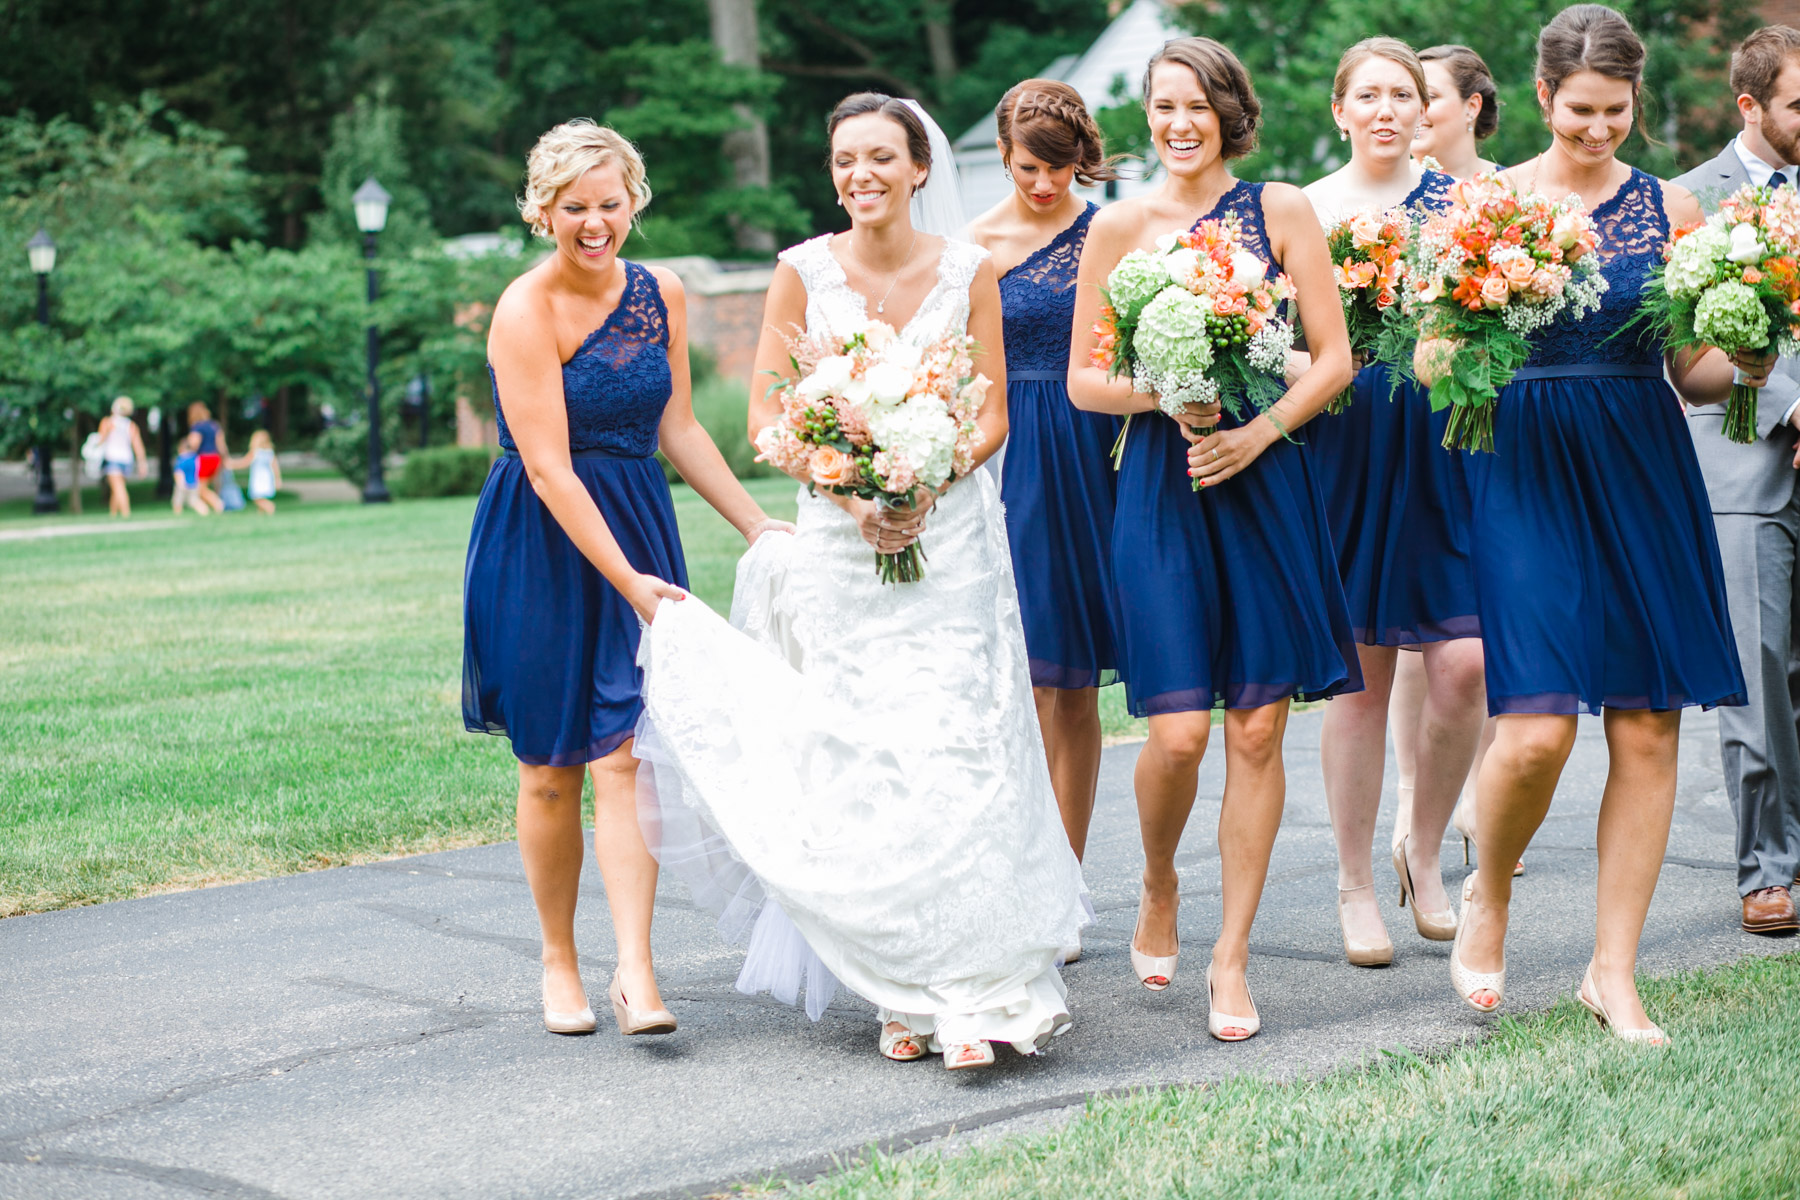 wildwood-park-wedding-photos-33.jpg